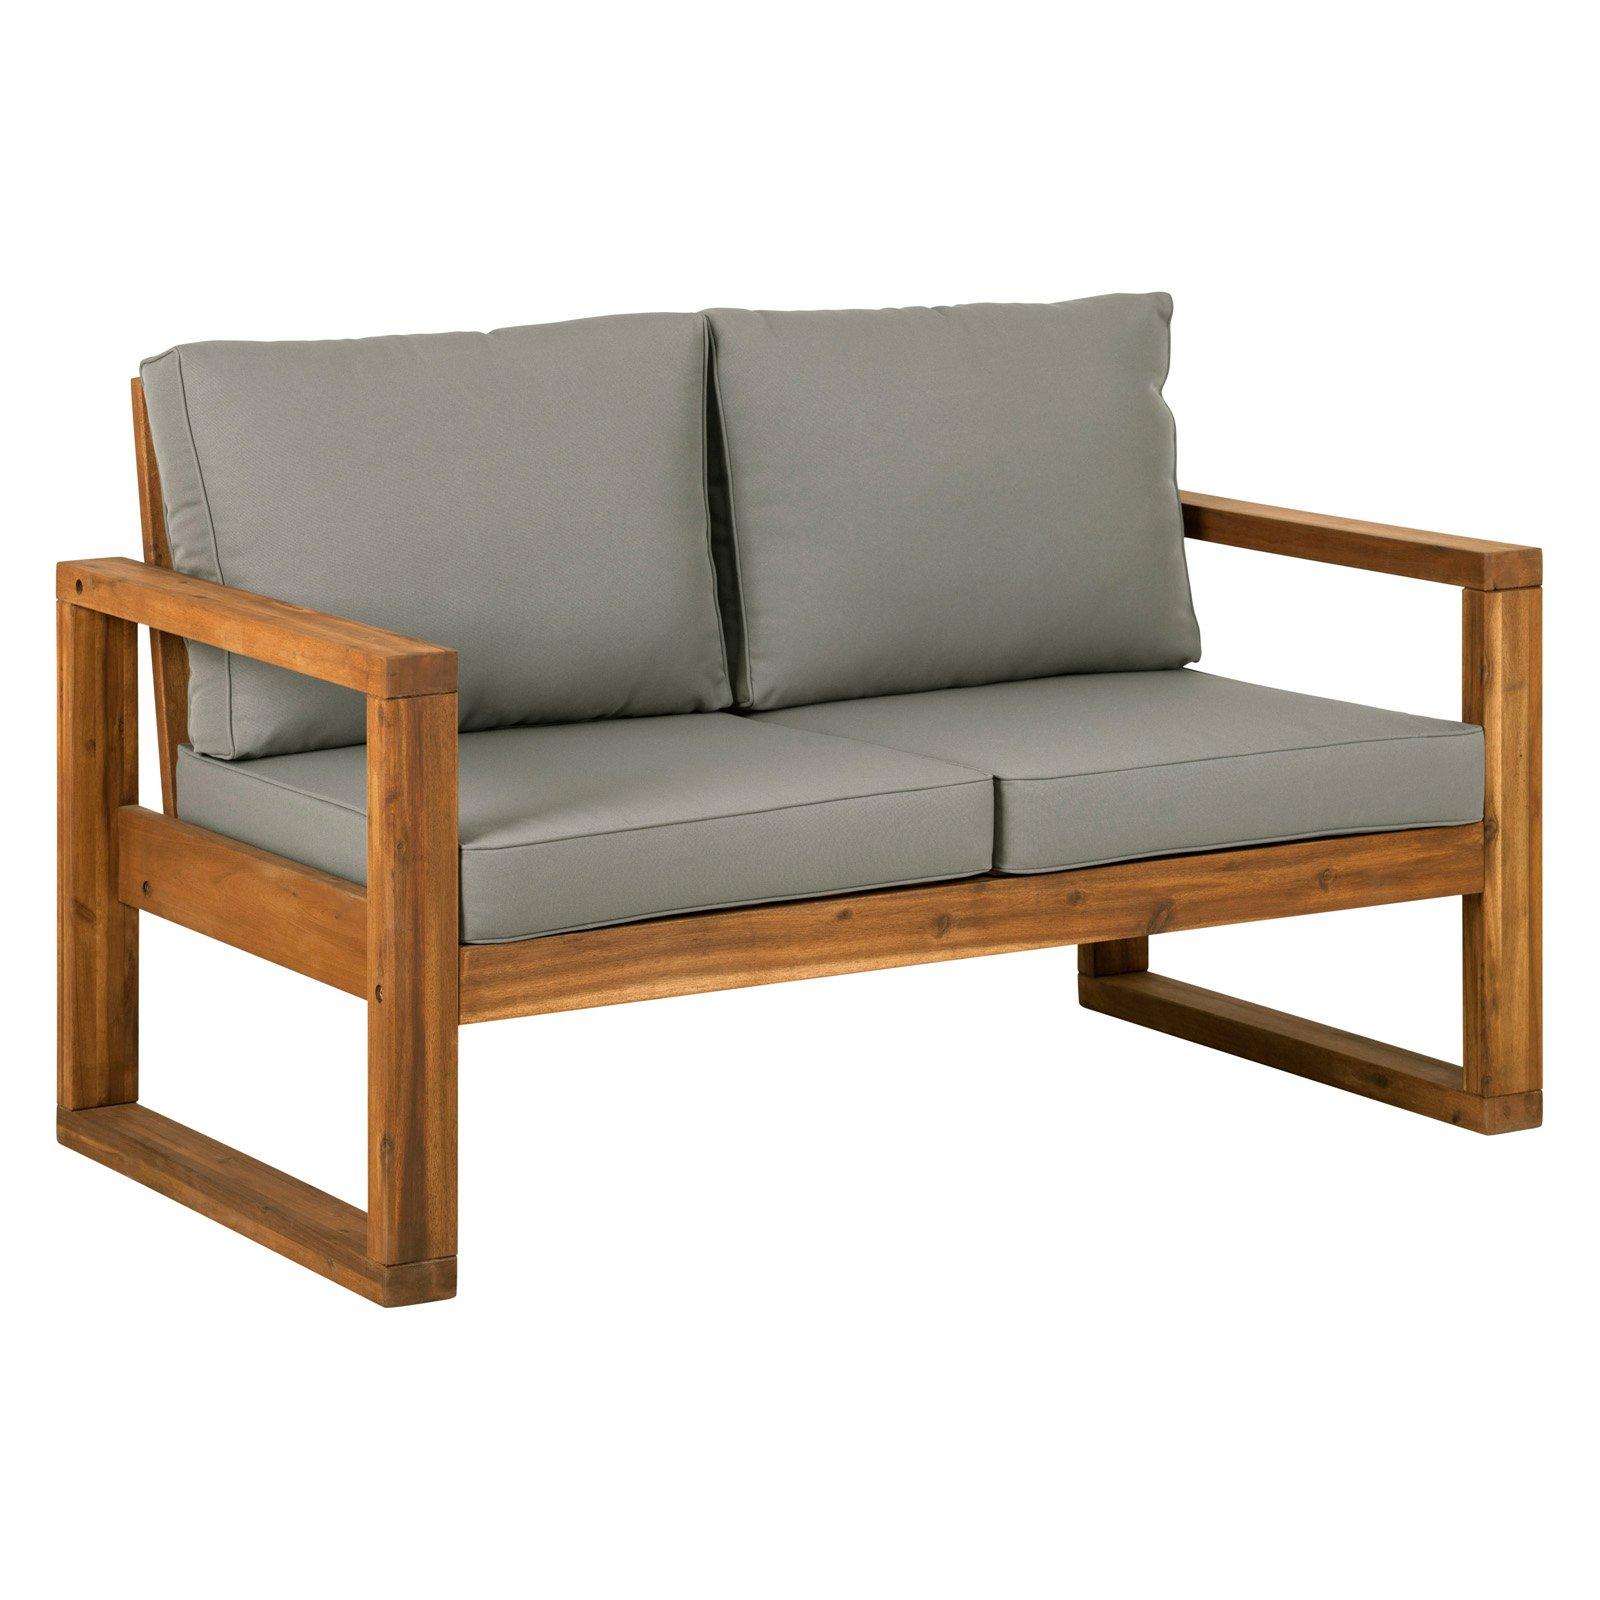 Walker Edison Open Side Patio Loveseat With Cushions